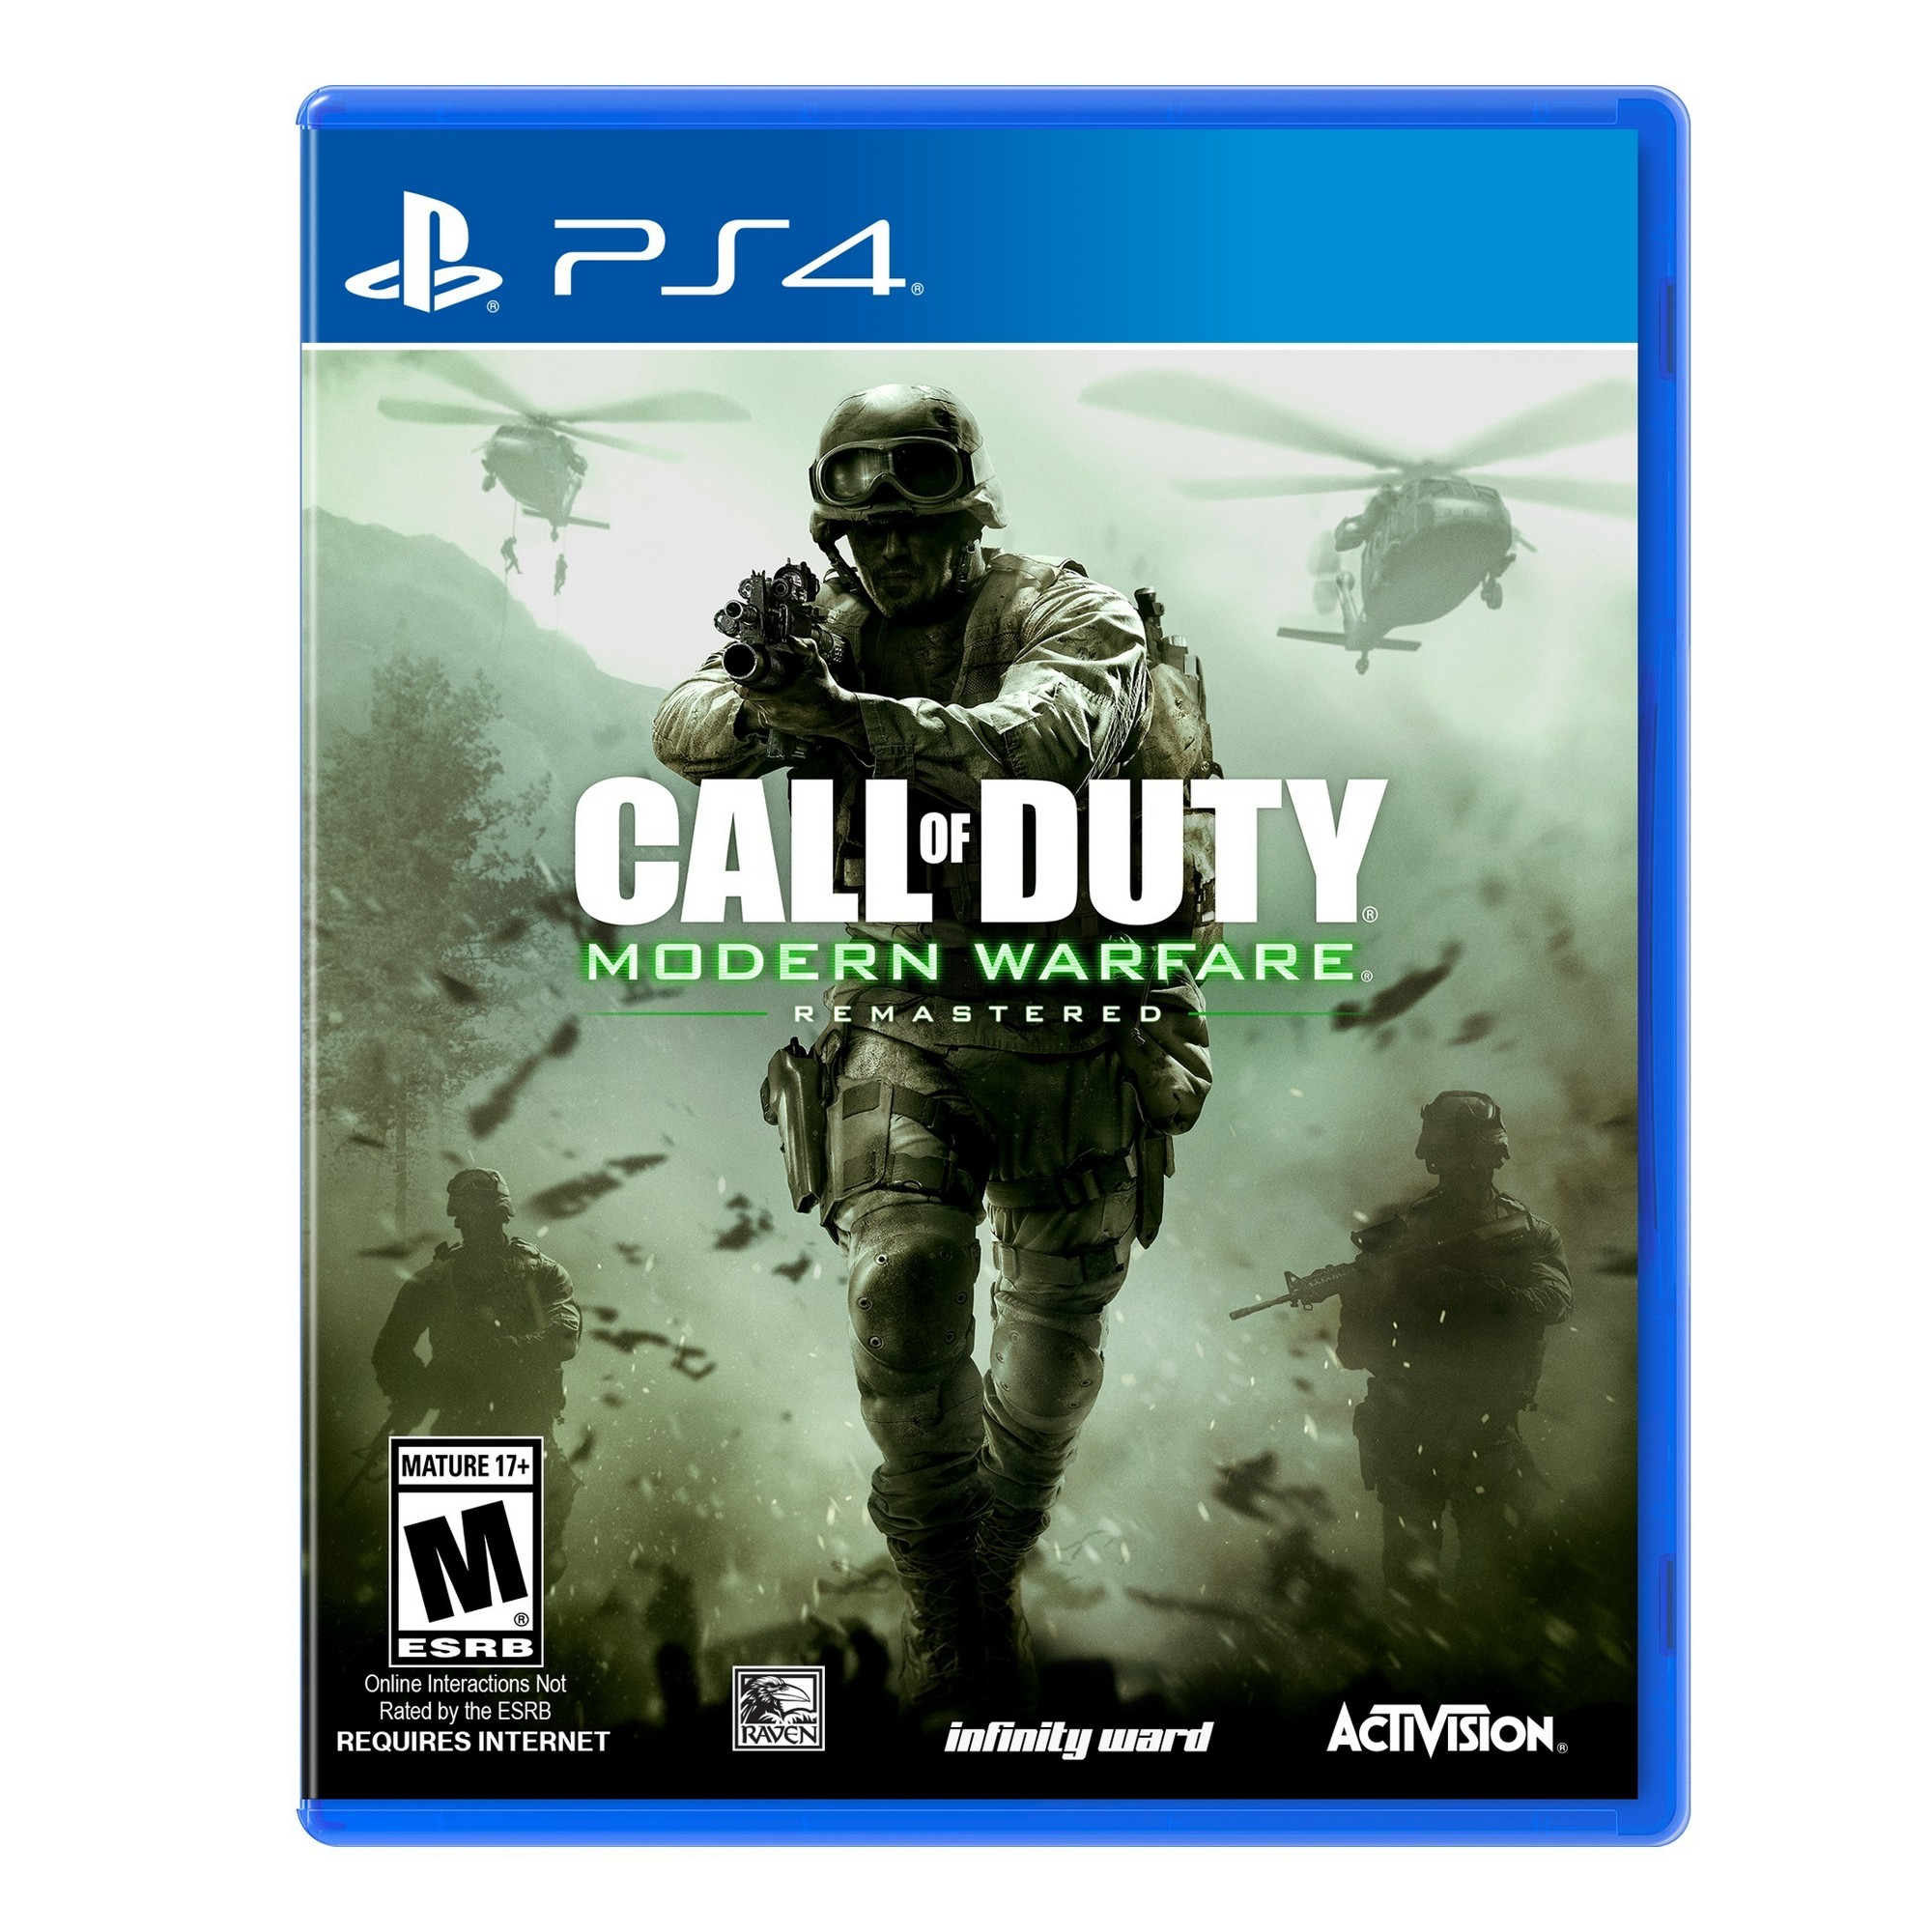 Call Of Duty Modern Warfare Remastered Playstation 4 Modern Warfare Call Of Duty Modern Warfare Game